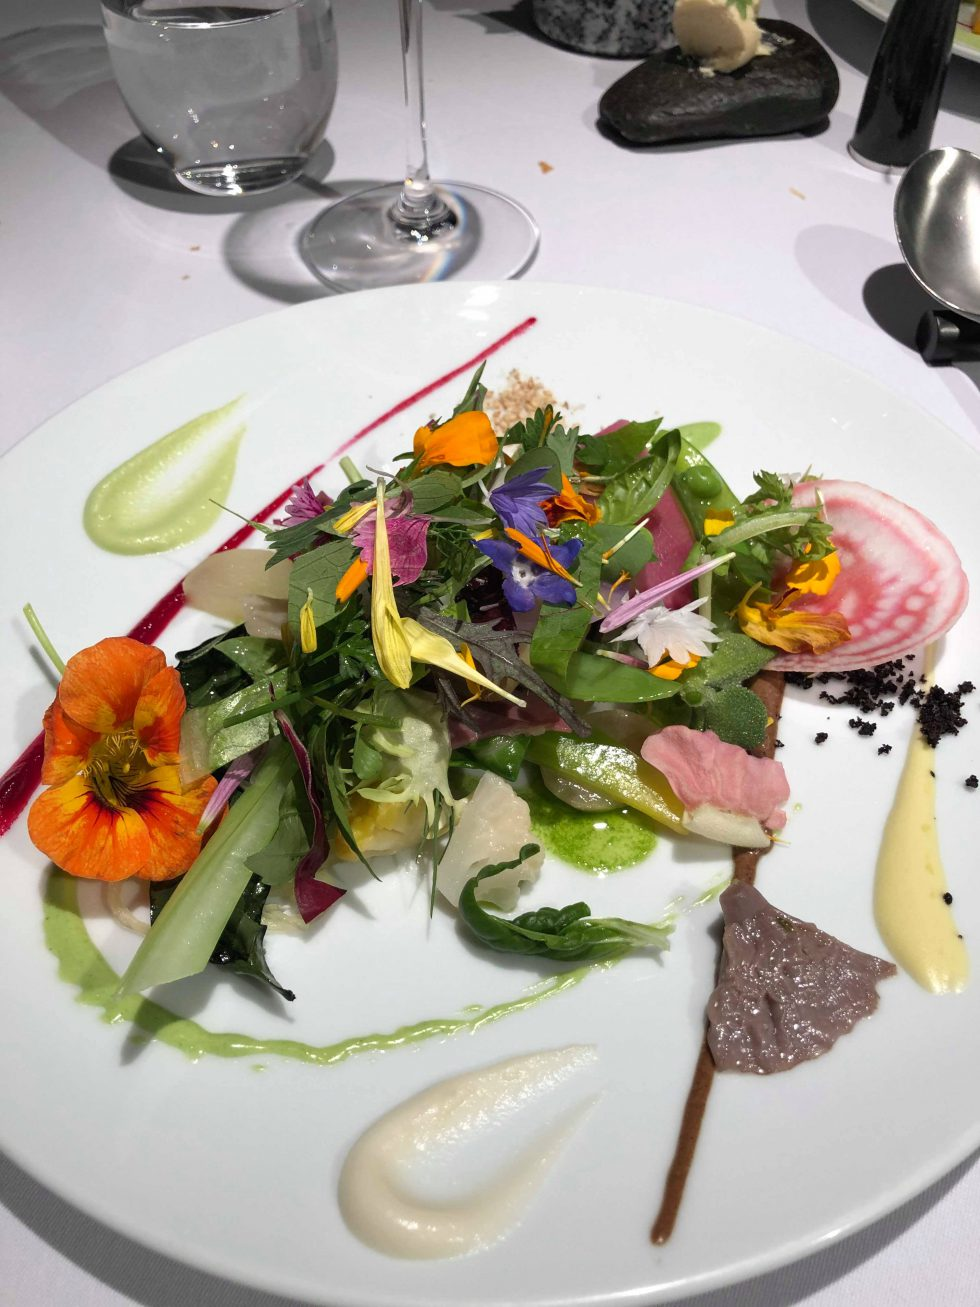 Michel Brasフェアで憧れのディナーを!!